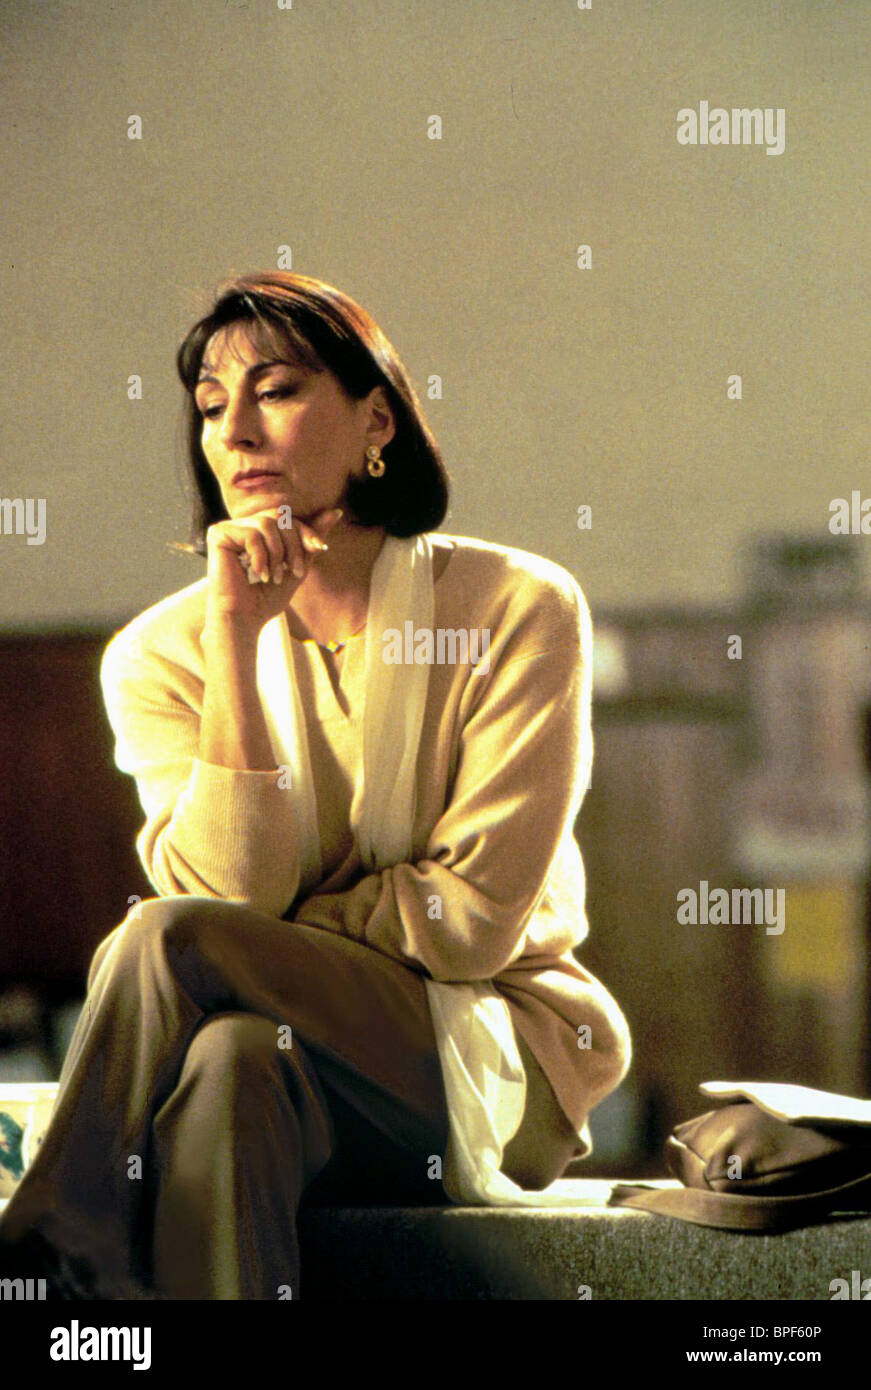 ANJELICA HUSTON THE CROSSING GUARD (1995) - Stock Image